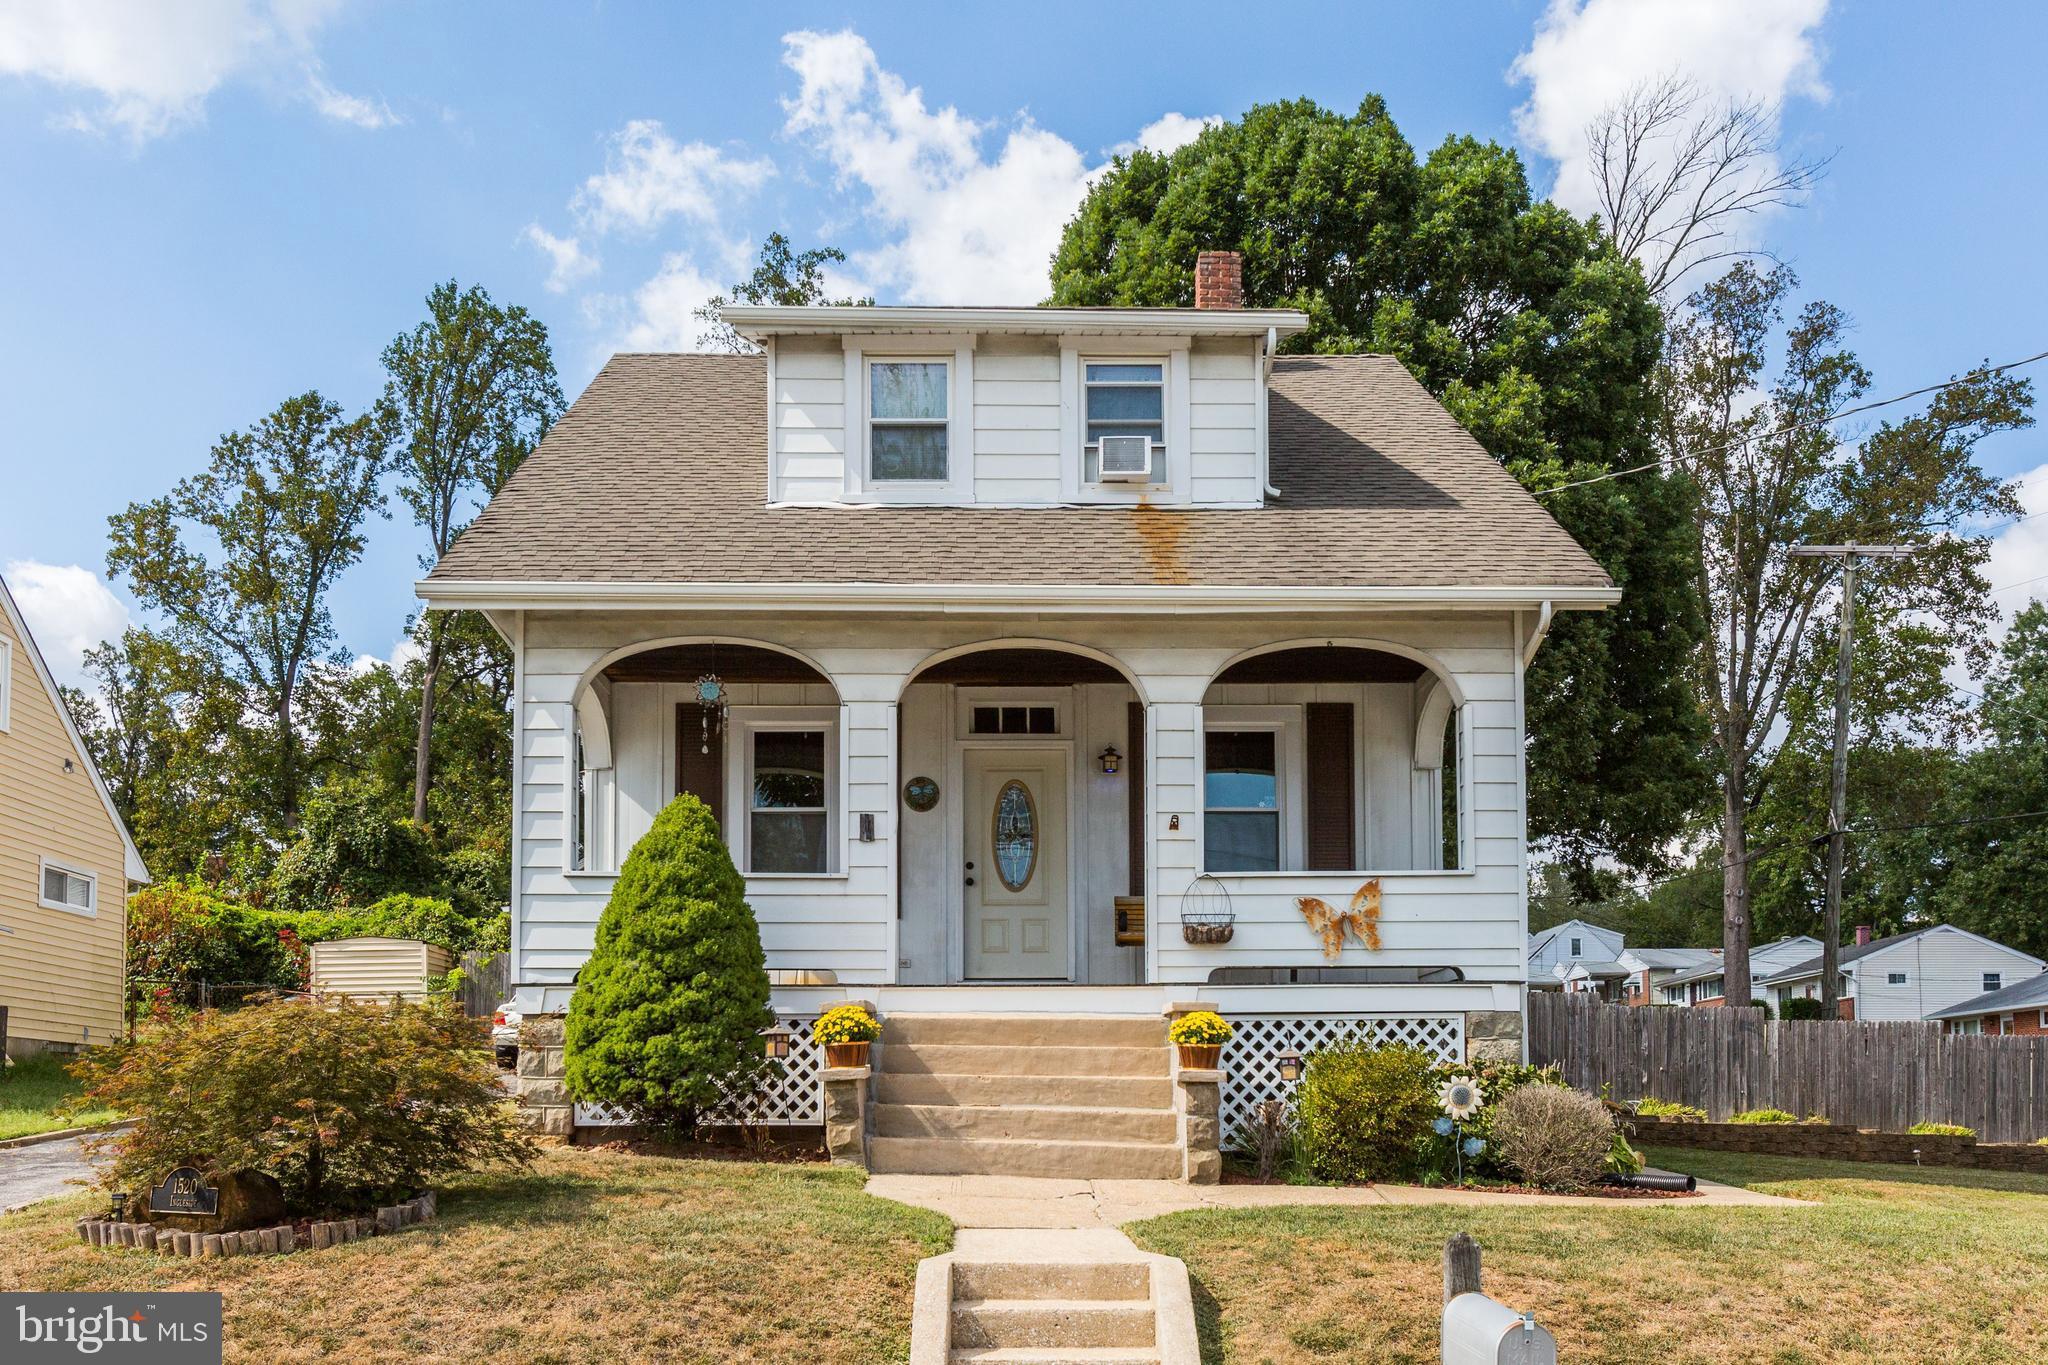 1520 INGLESIDE Ave, Baltimore, MD, 21207